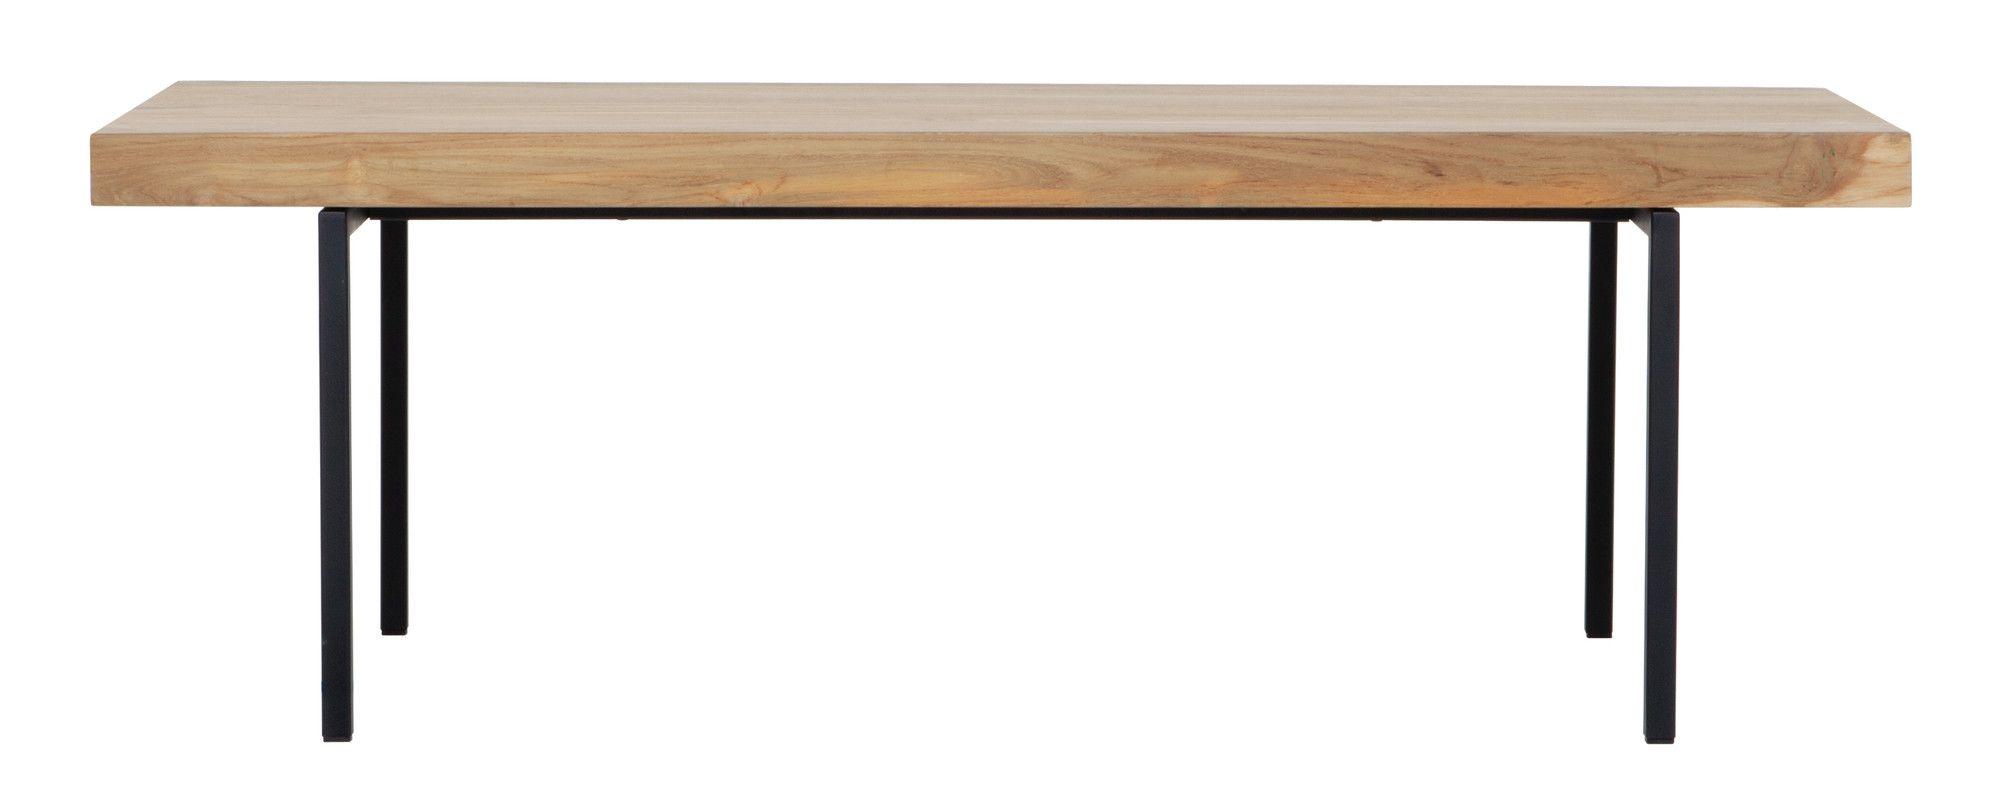 Eq3 Reclaimed Teak Coffee Table Reclaimed Coffee Table Coffee Table Teak Coffee Table